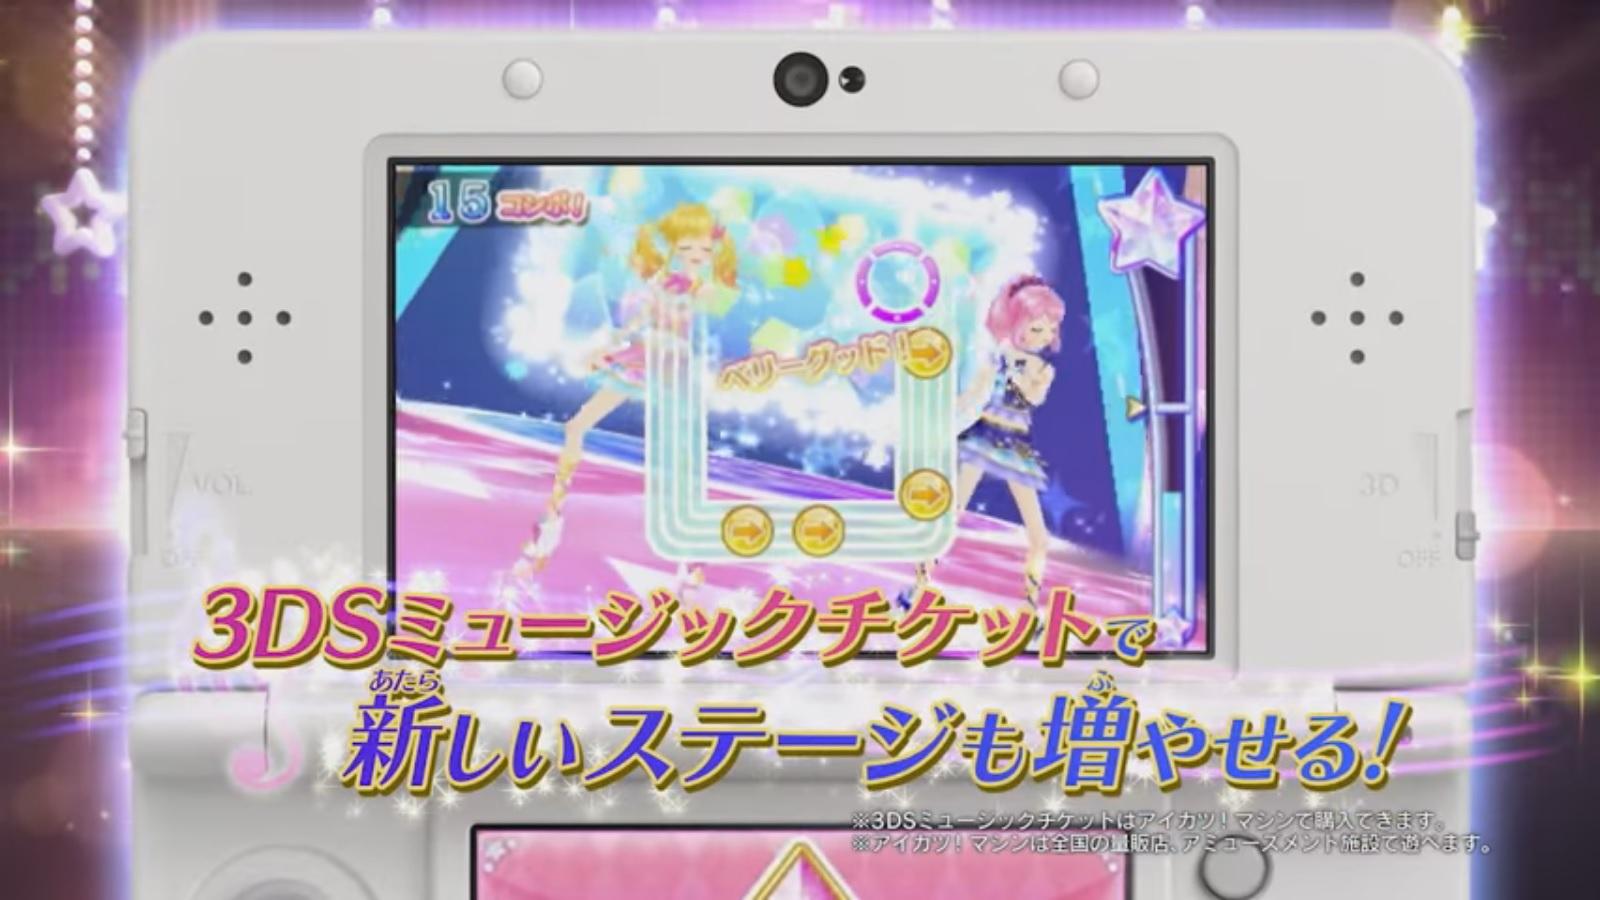 Aikatsu Stars! First Appeal trailer